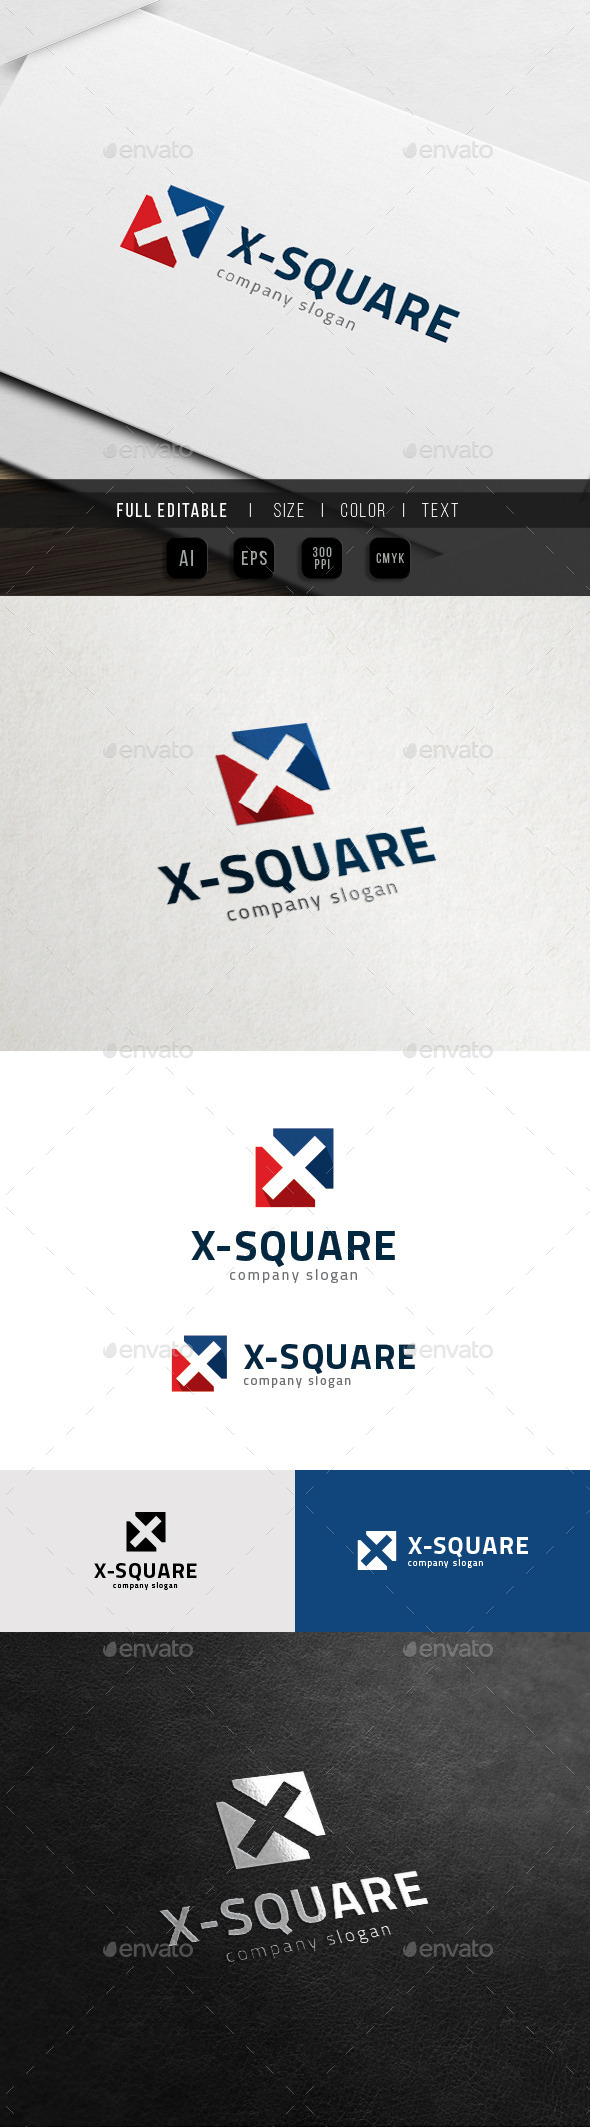 X Logo - Square Cross Sport - Letters Logo Templates